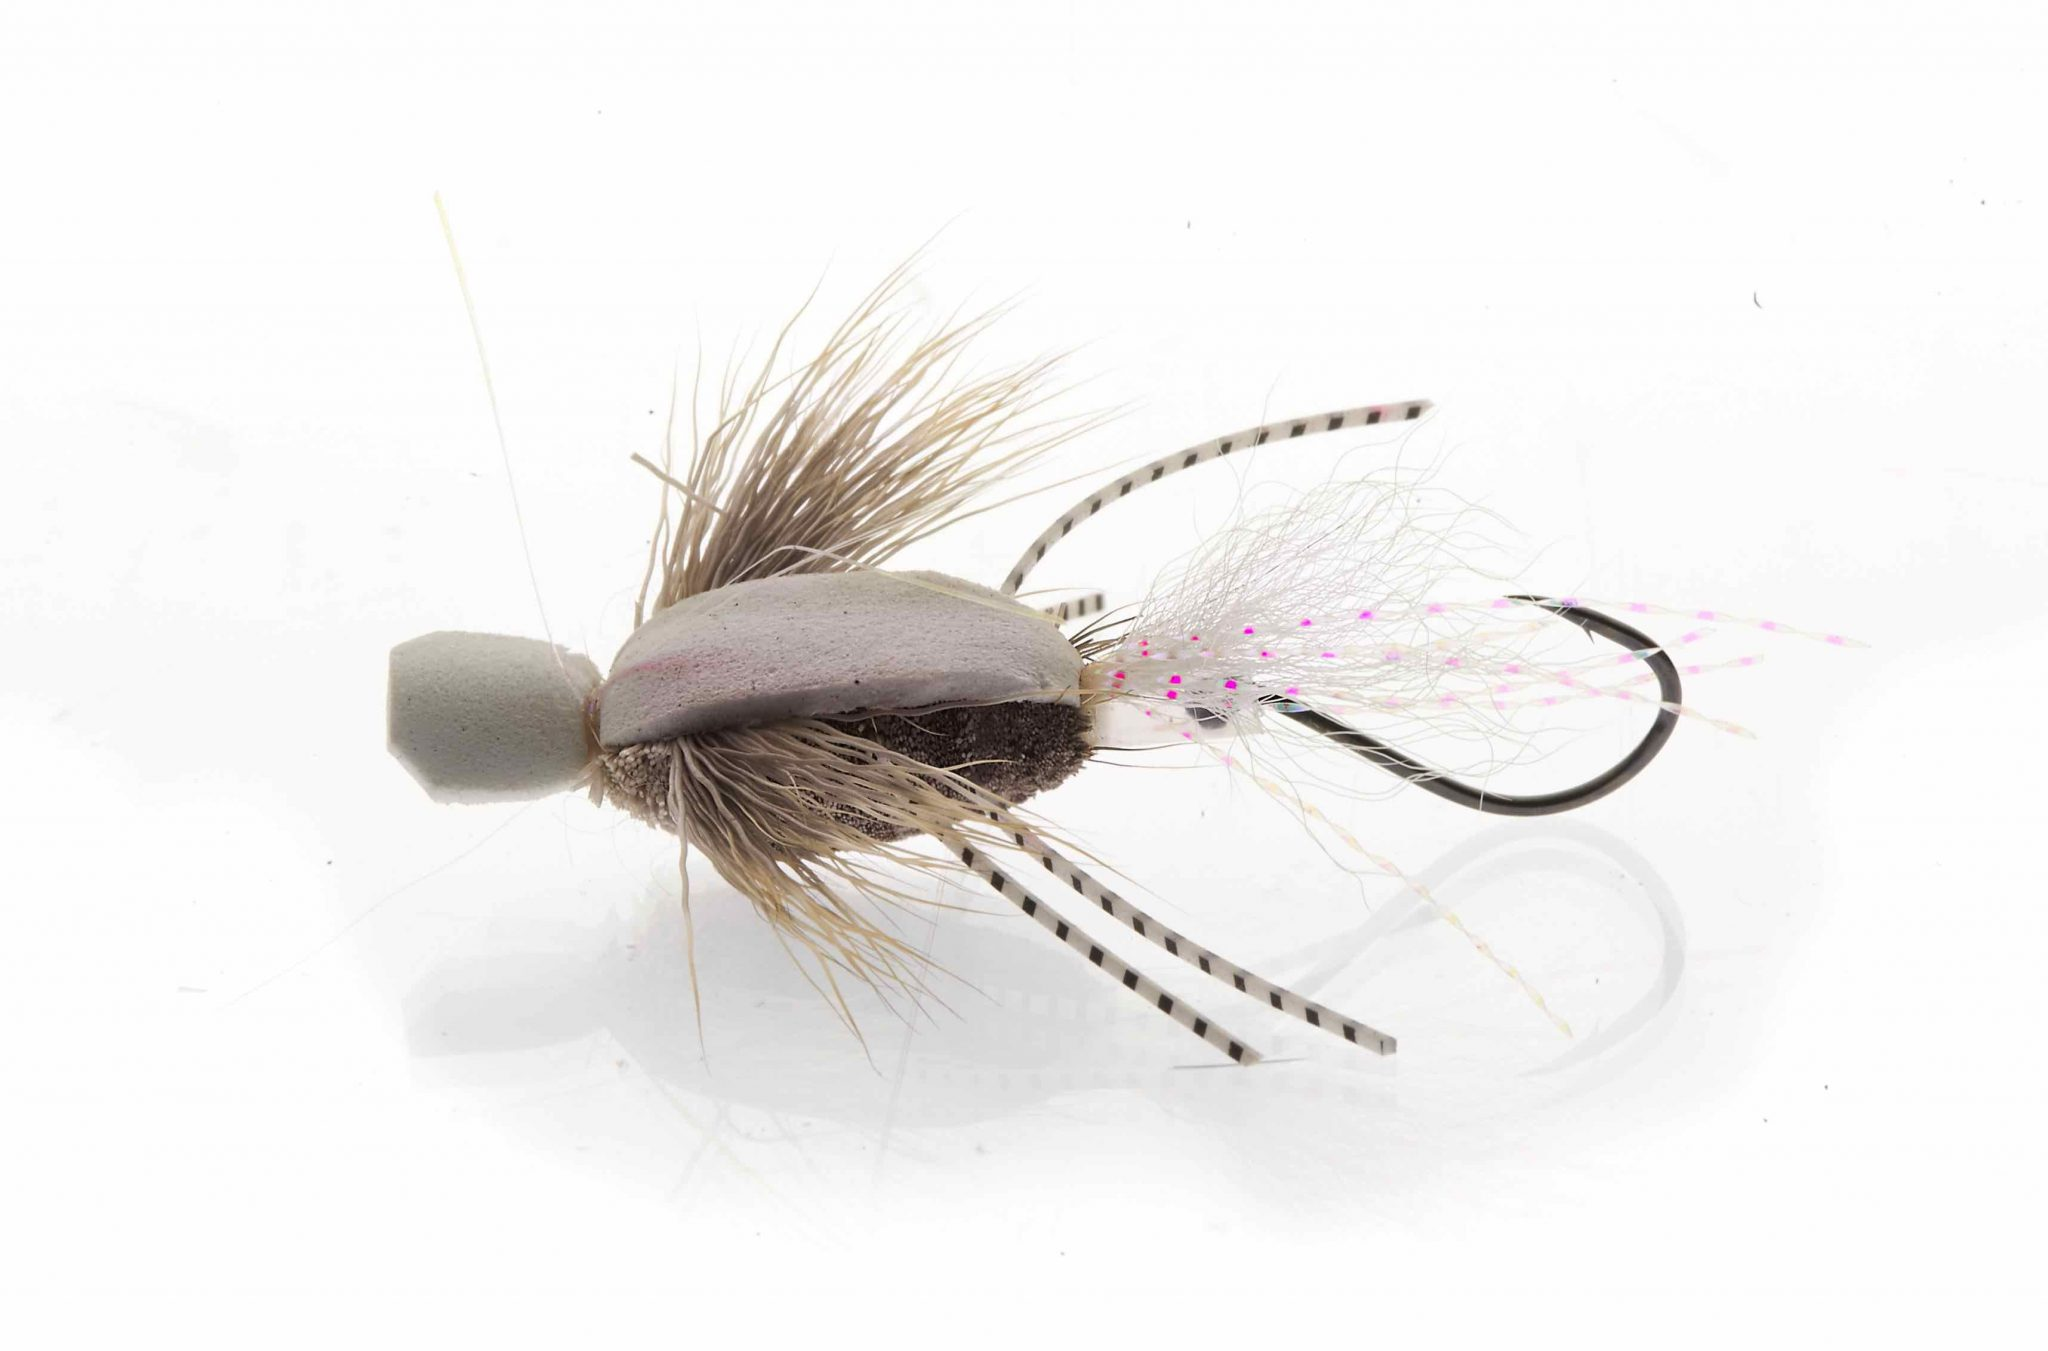 Ska-opper steelhead wake fly